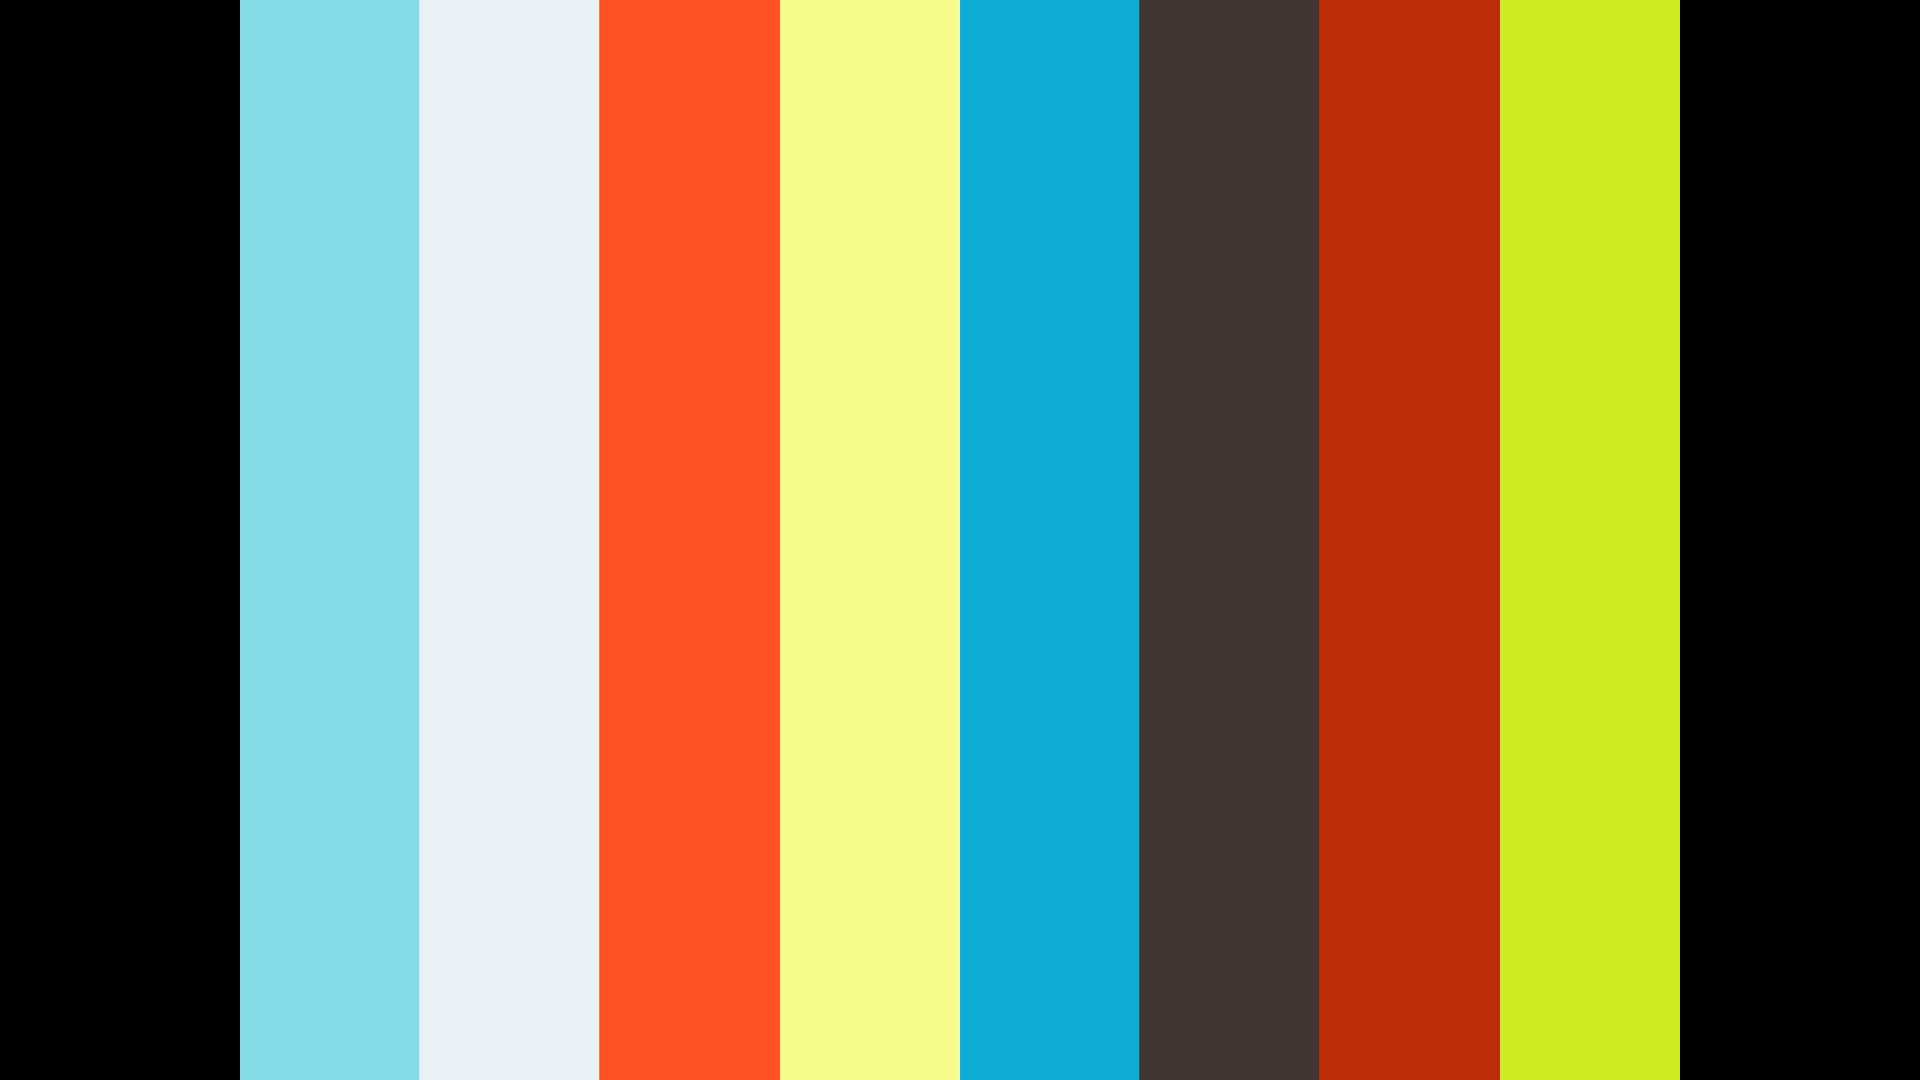 TAE DEX - ABSOLUTE 45 (9 SEPTEMBER 2021)